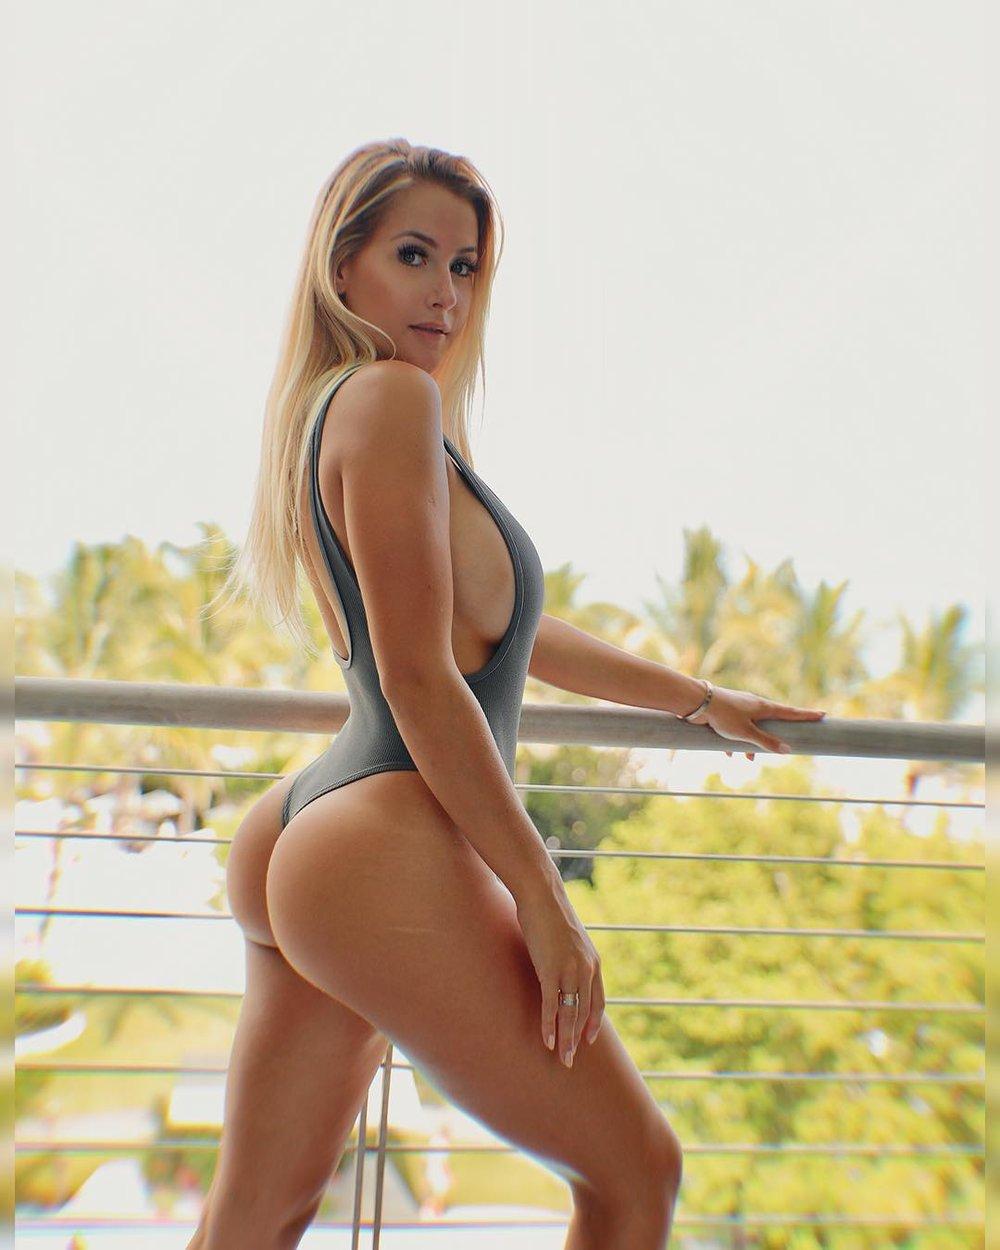 bikini_model_portrait_photography_23.jpg